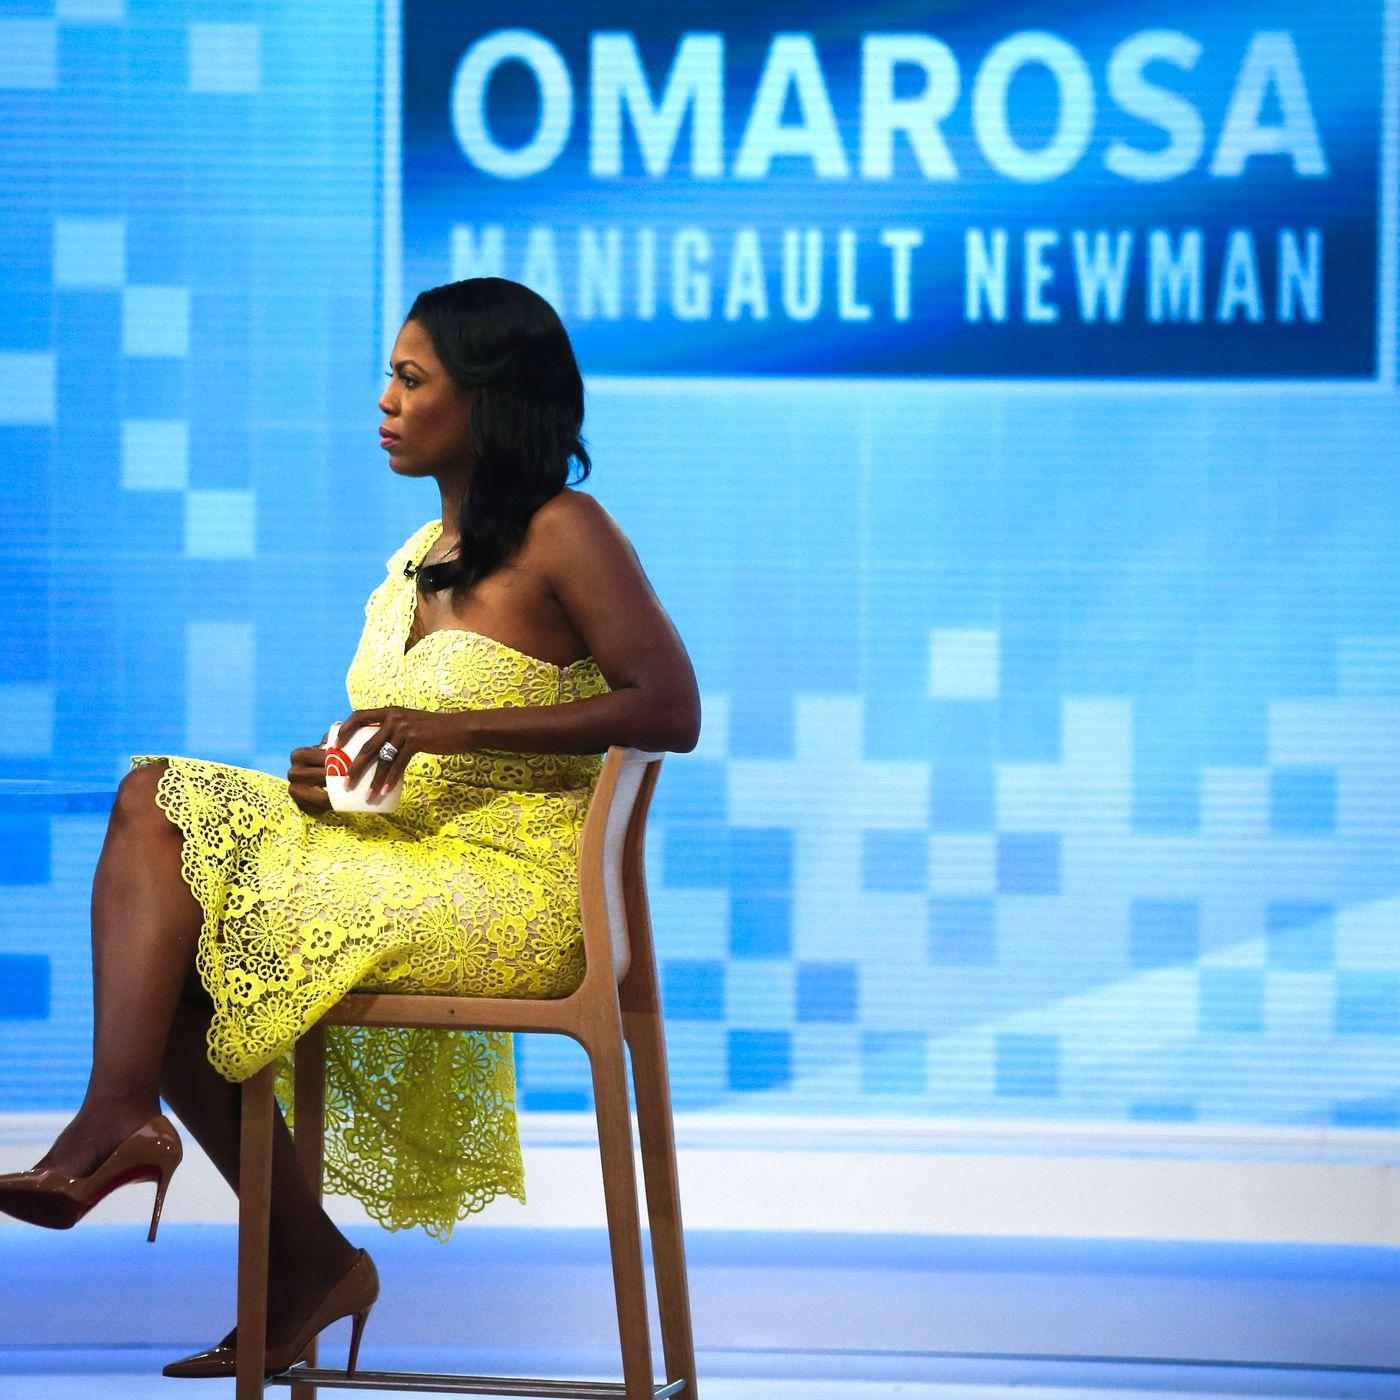 Pleasant Omarosa Manigault Newman And Her White House Tape Recordings Short Links Chair Design For Home Short Linksinfo